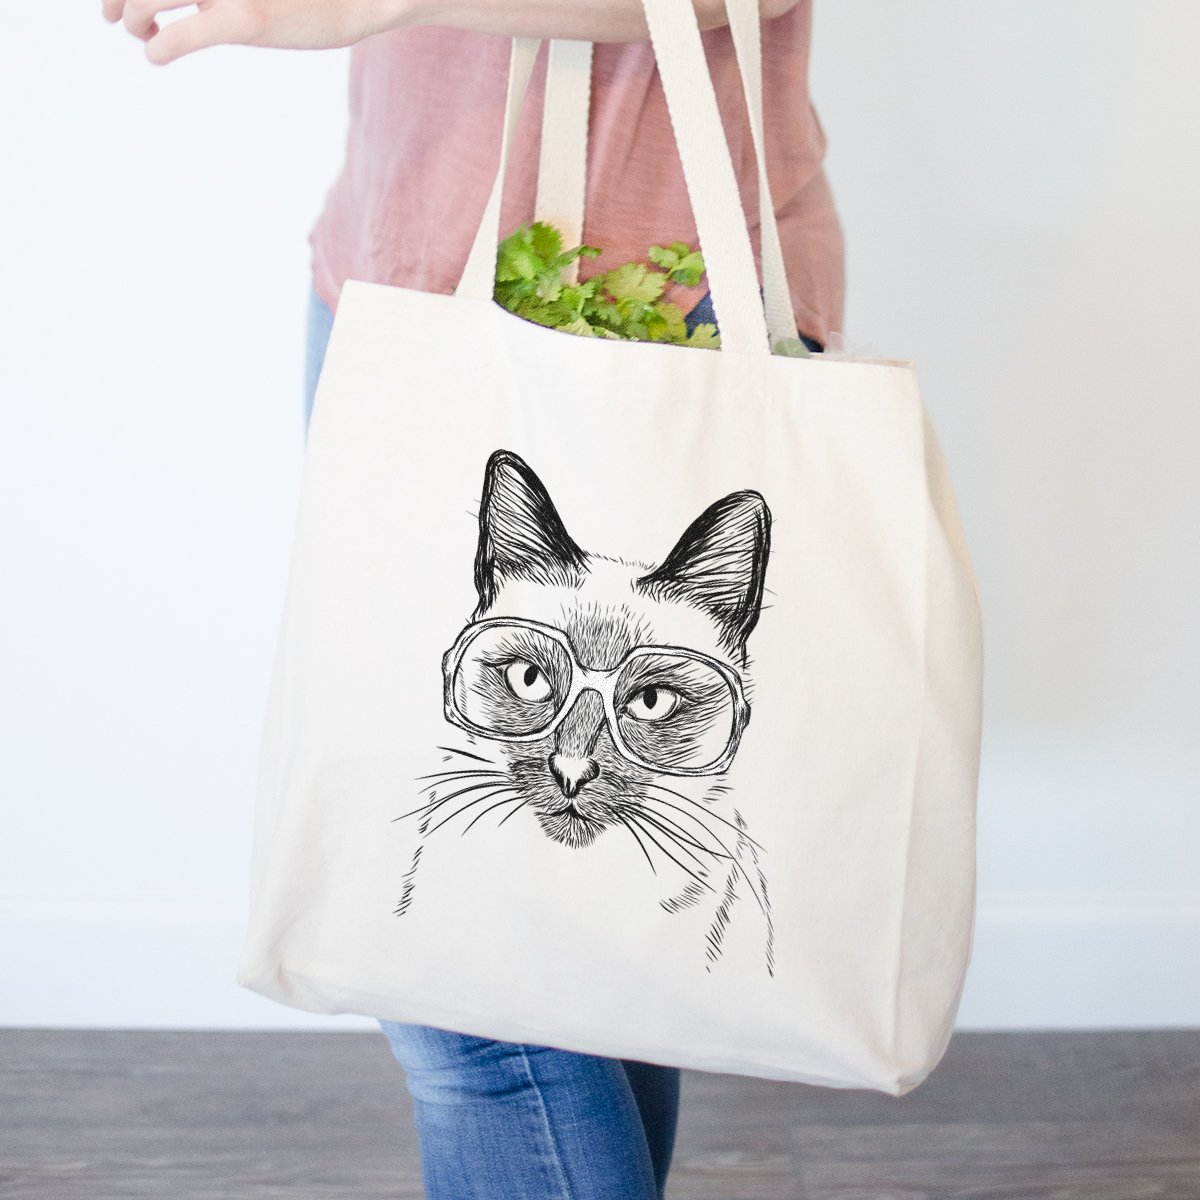 Sasha The Siamese Cat Heavy Duty 100 %コットンキャンバストートバッグショッピングReusable Grocery Bag 14.75インチx 14.75 X 5 Printed 1 Side ベージュ TOTE-sasha-siamese-1-side B0793GZV5X  Printed 1 Side